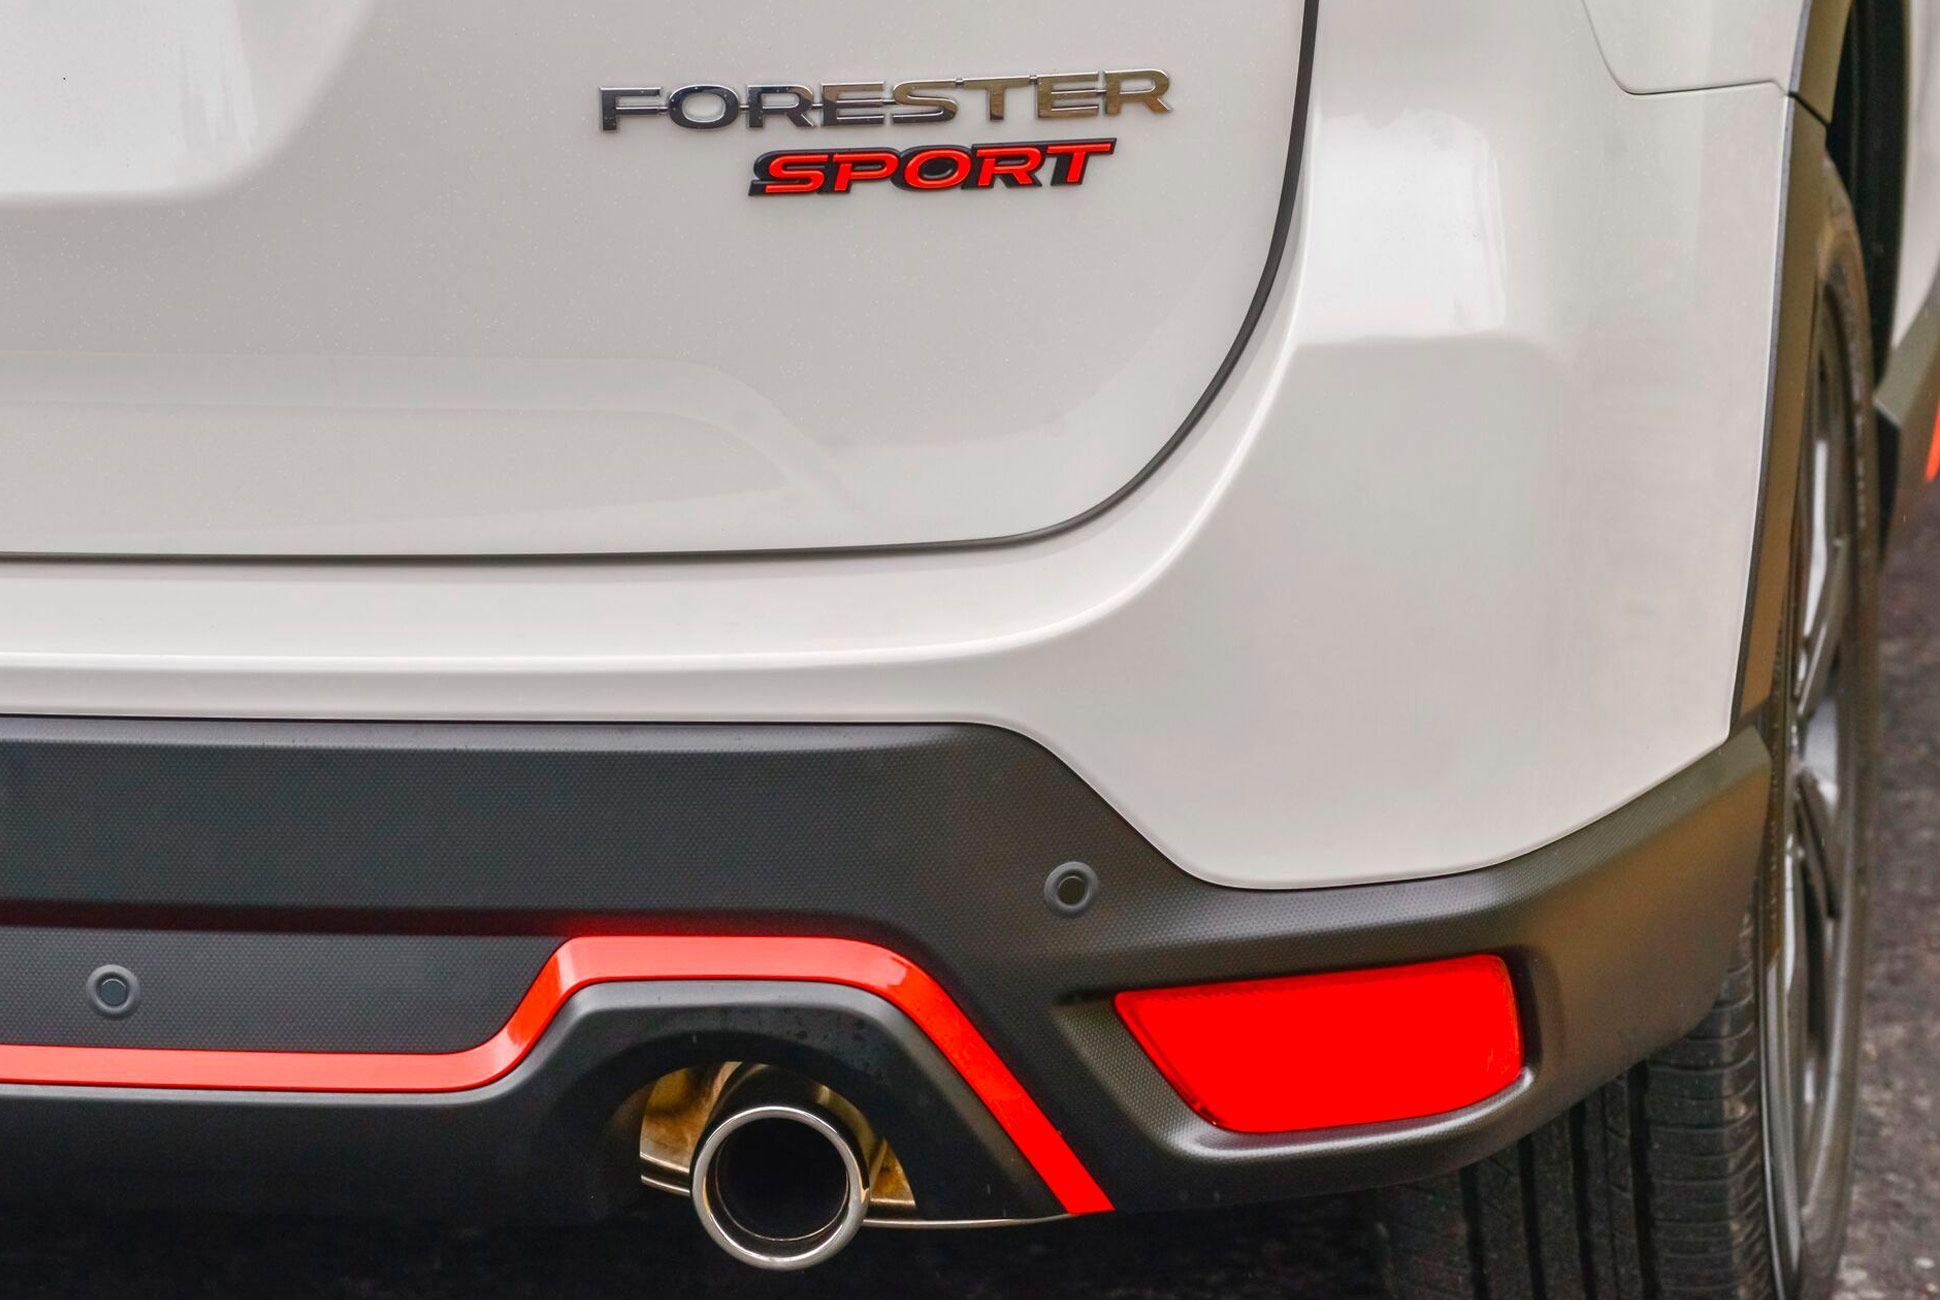 2019-Subaru-Forester-Gear-Patrol-Slide-8